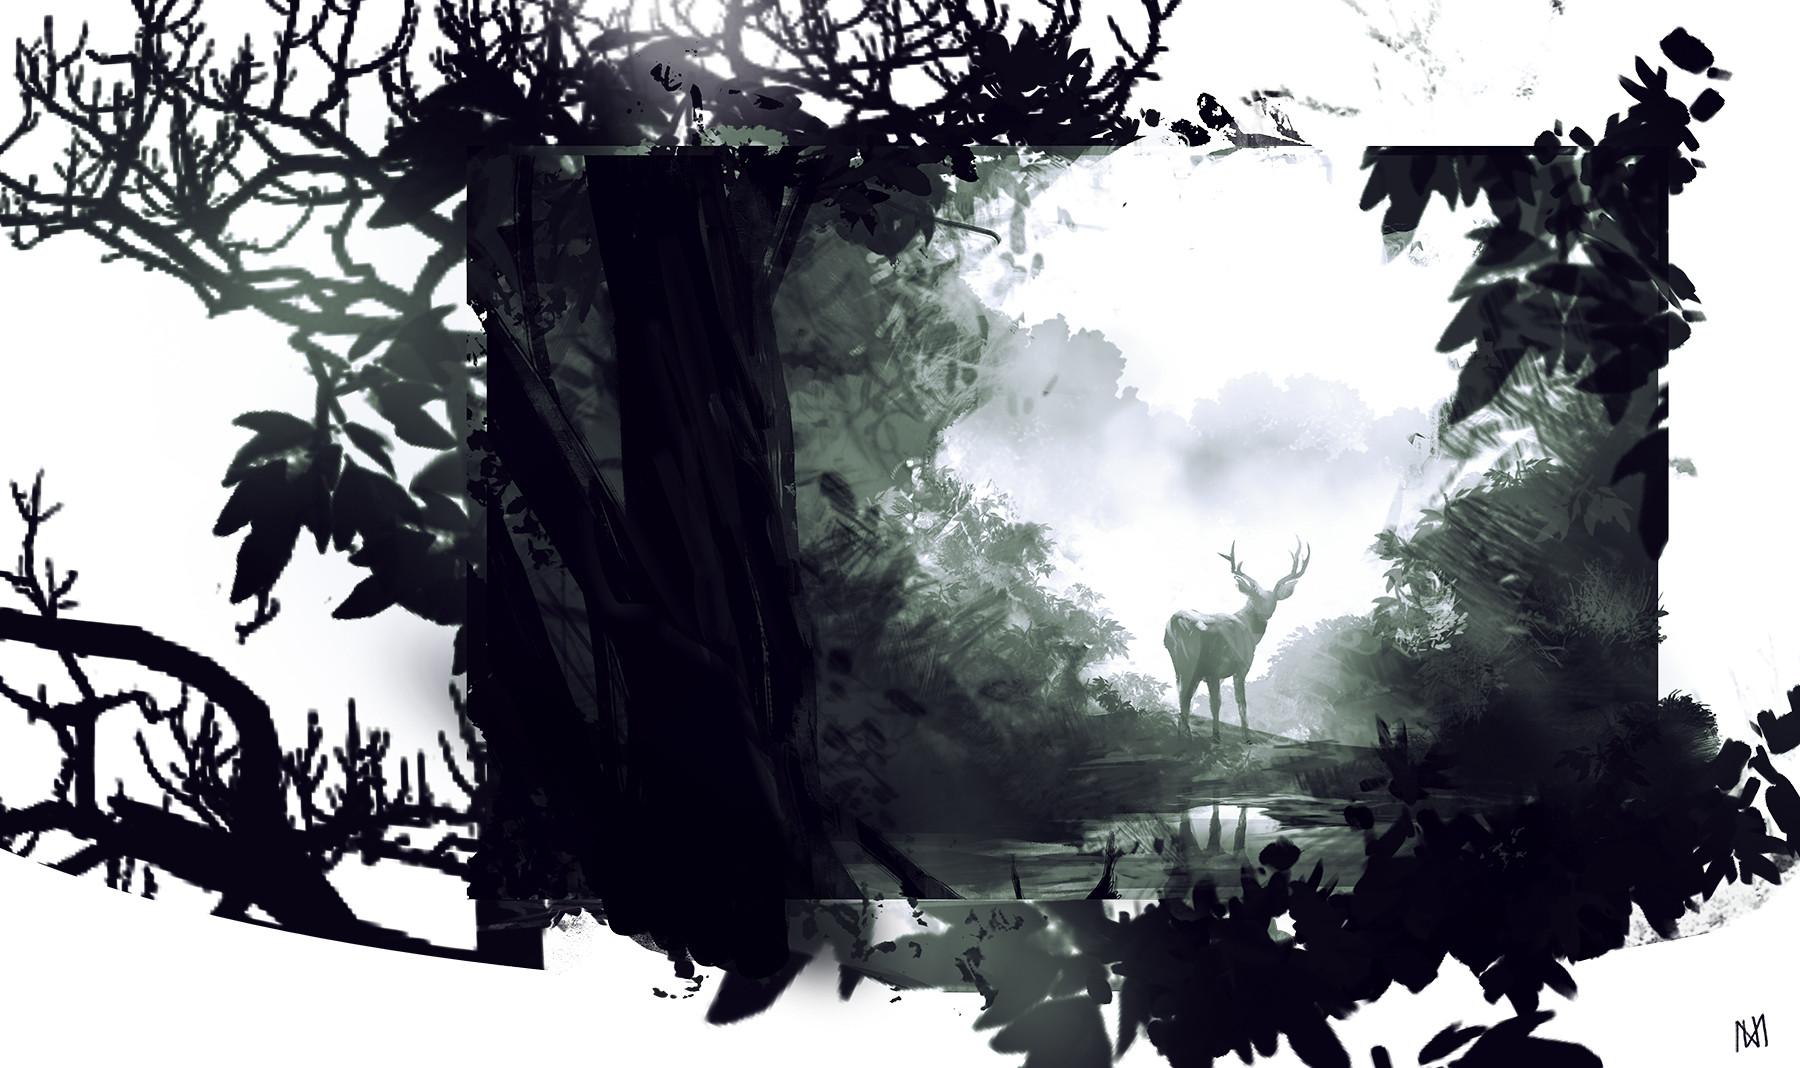 Nagy norbert deer forest